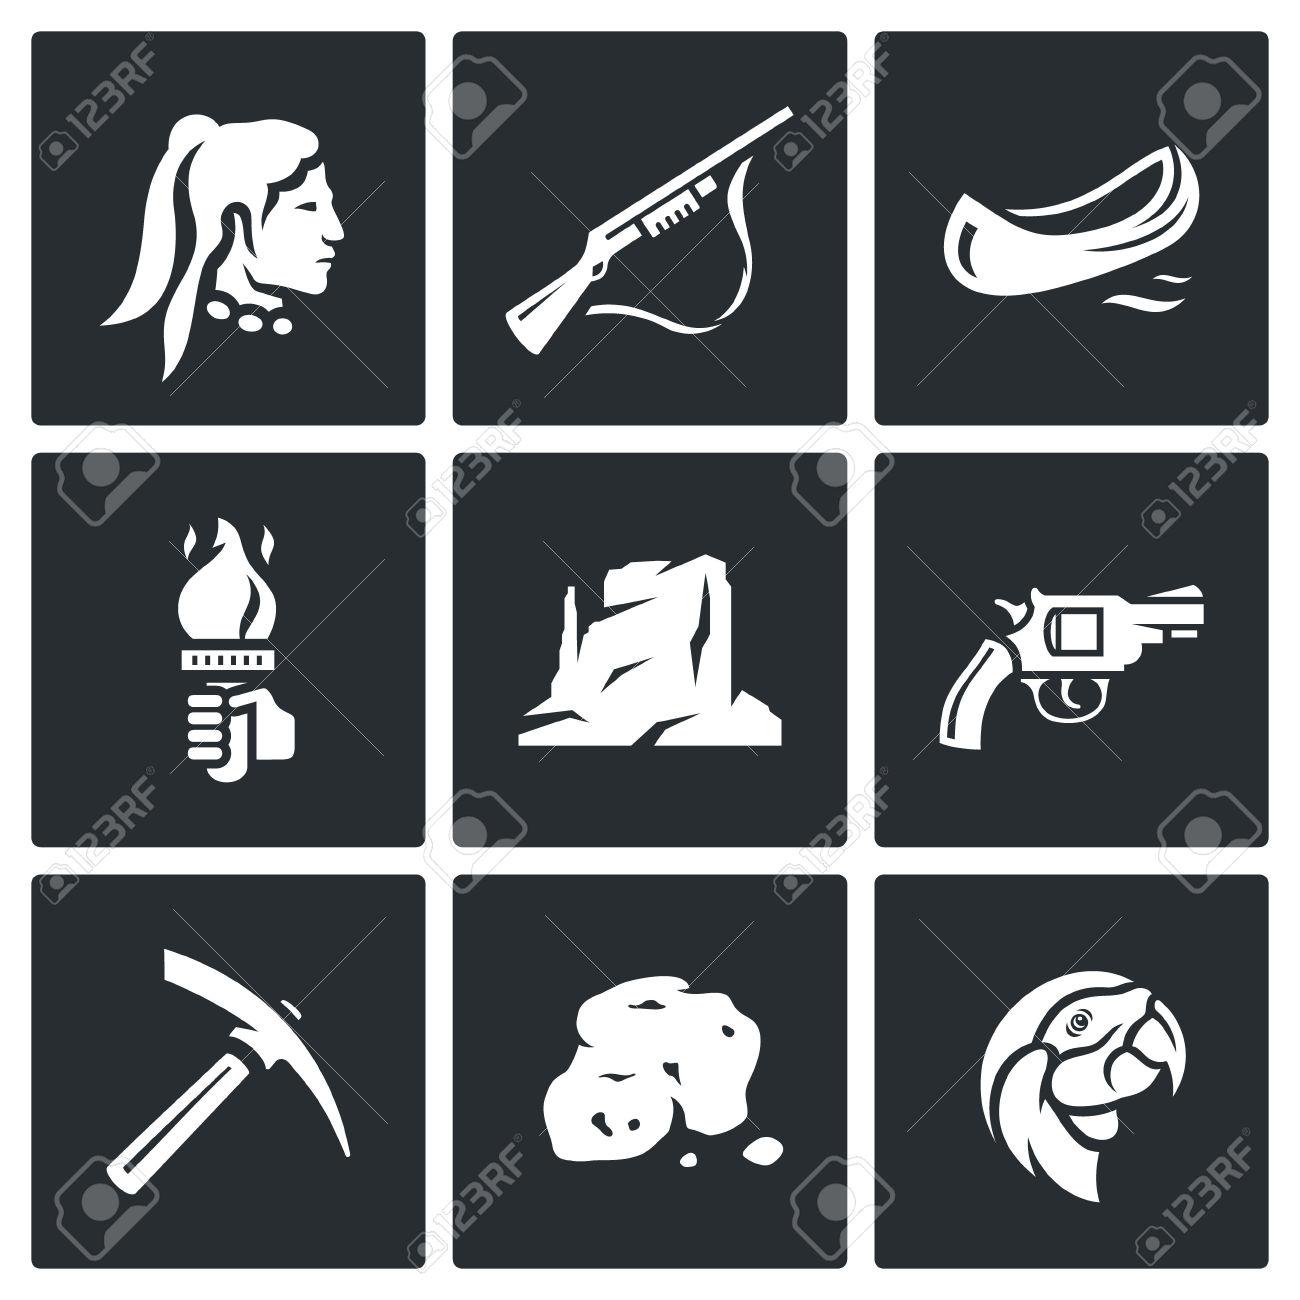 Red Indian, Weapon, Boat, Light, Mountain, Handgun, Pick, Ore.